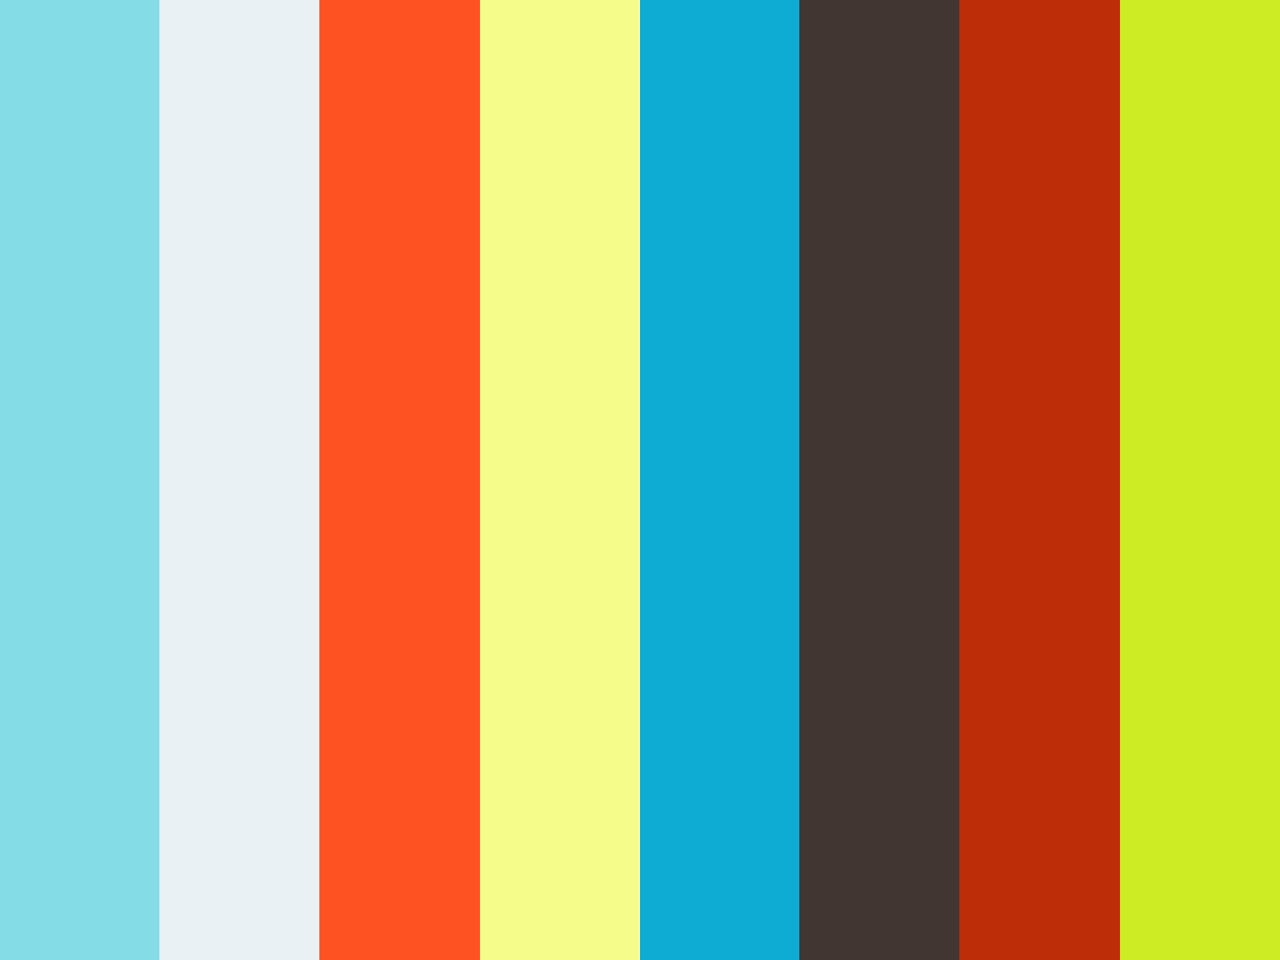 Molokai Covid19 Update - Thursday, April 23, 2020